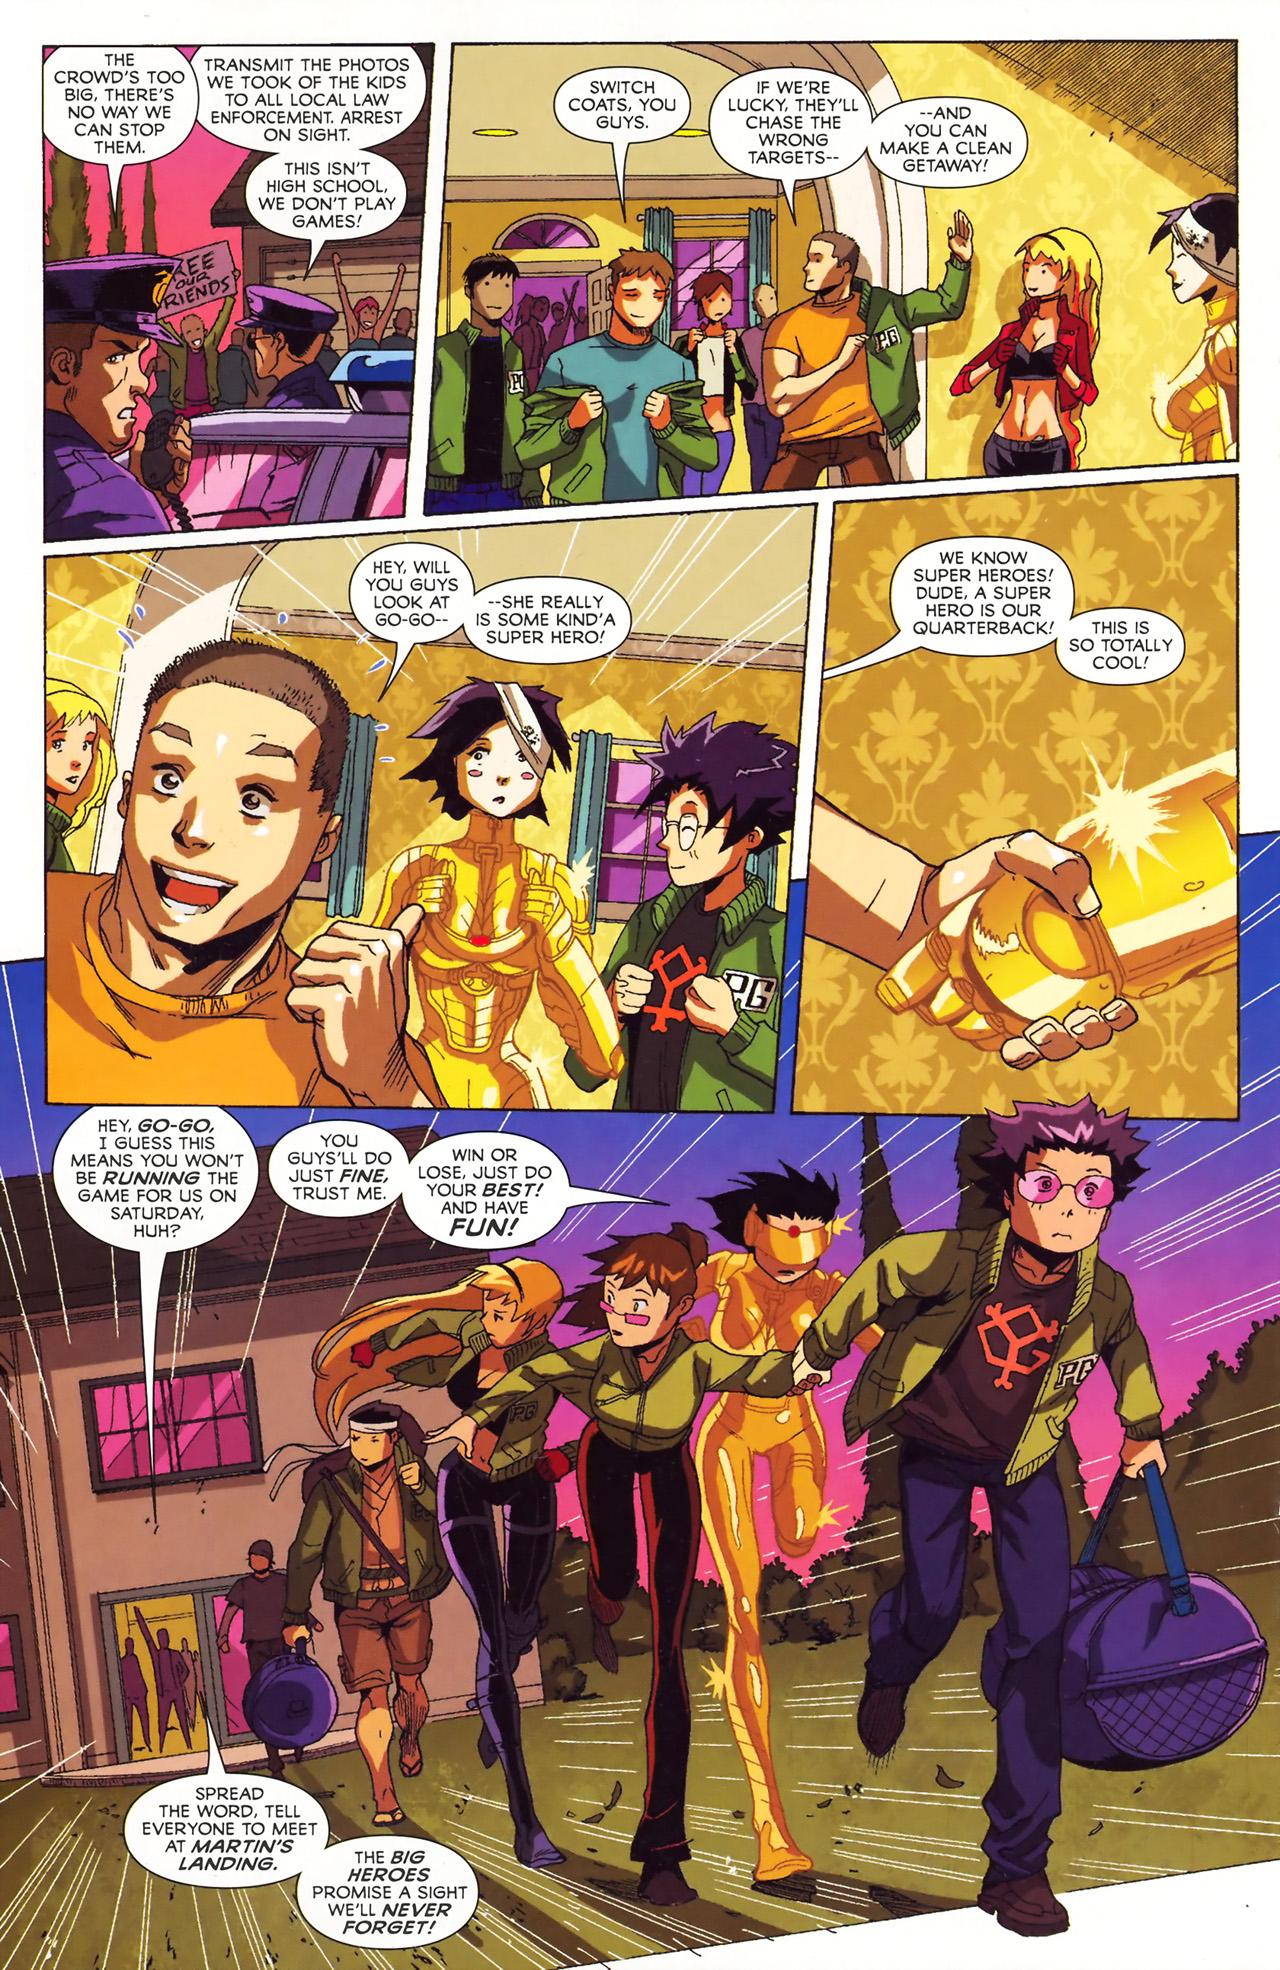 Big Hero Comic big hero 6 (2008) #5 - read big hero 6 (2008) issue #5 page 10